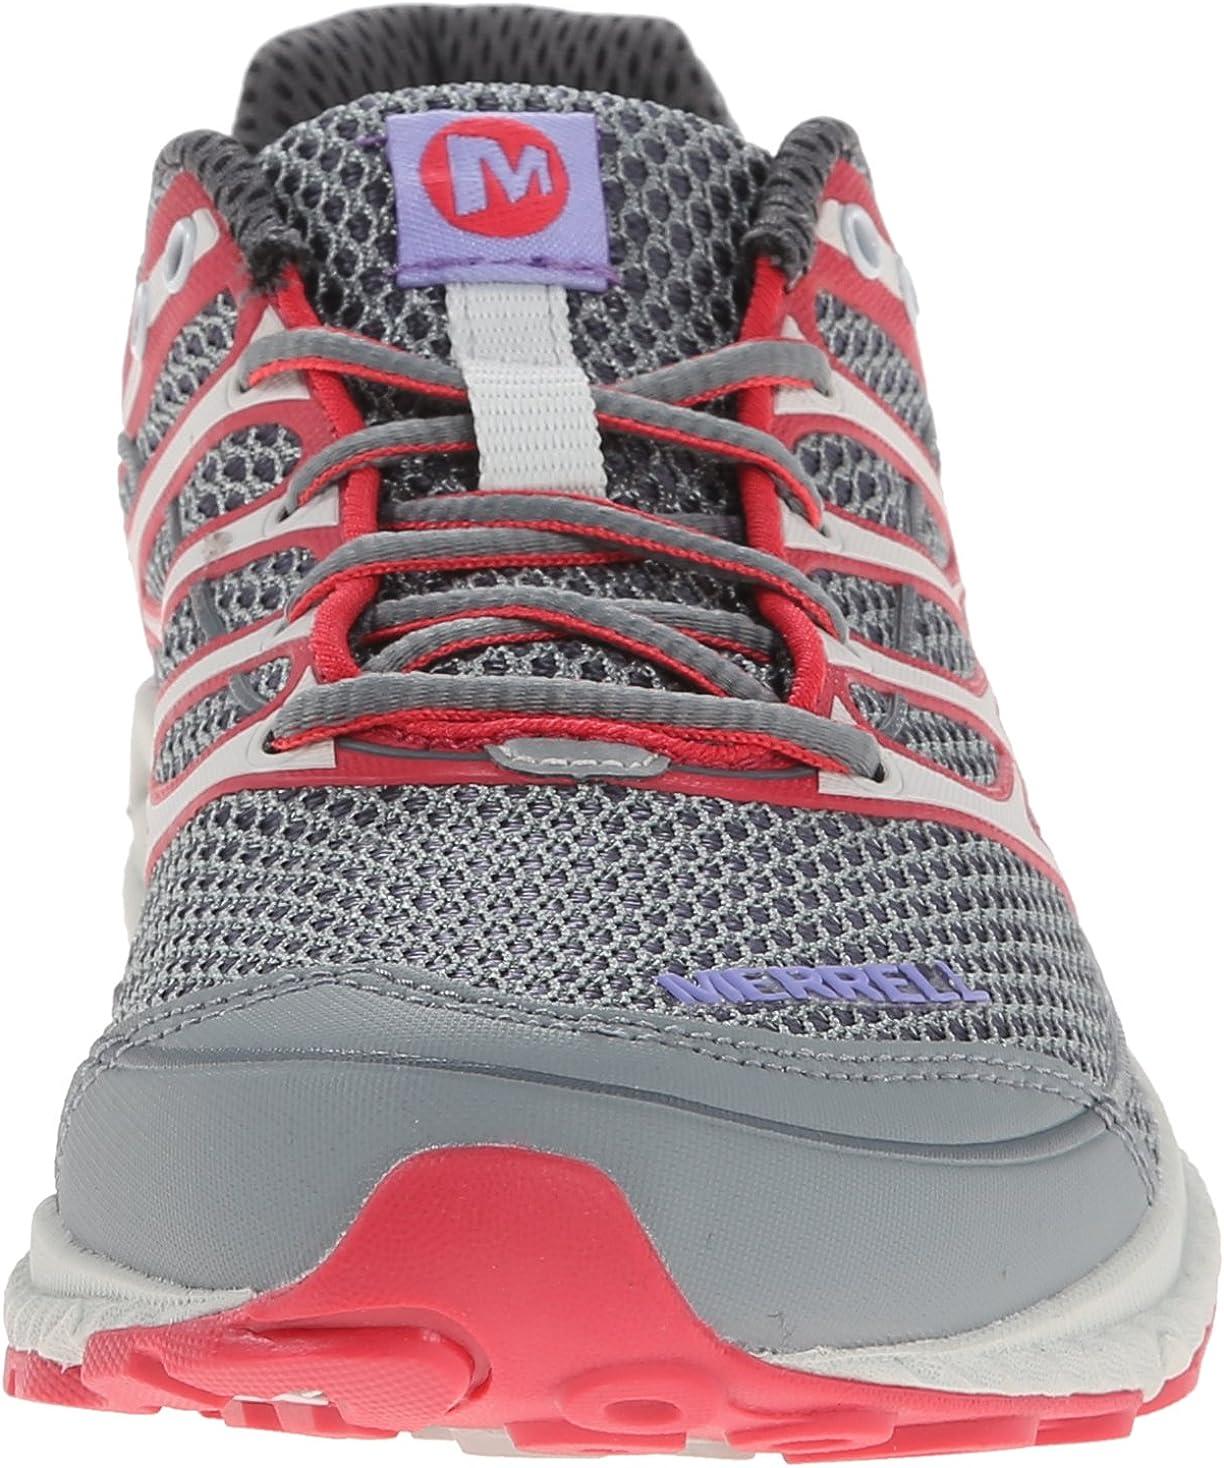 Merrell Women s Mix Master Move Glide 2 Trail Running Shoe